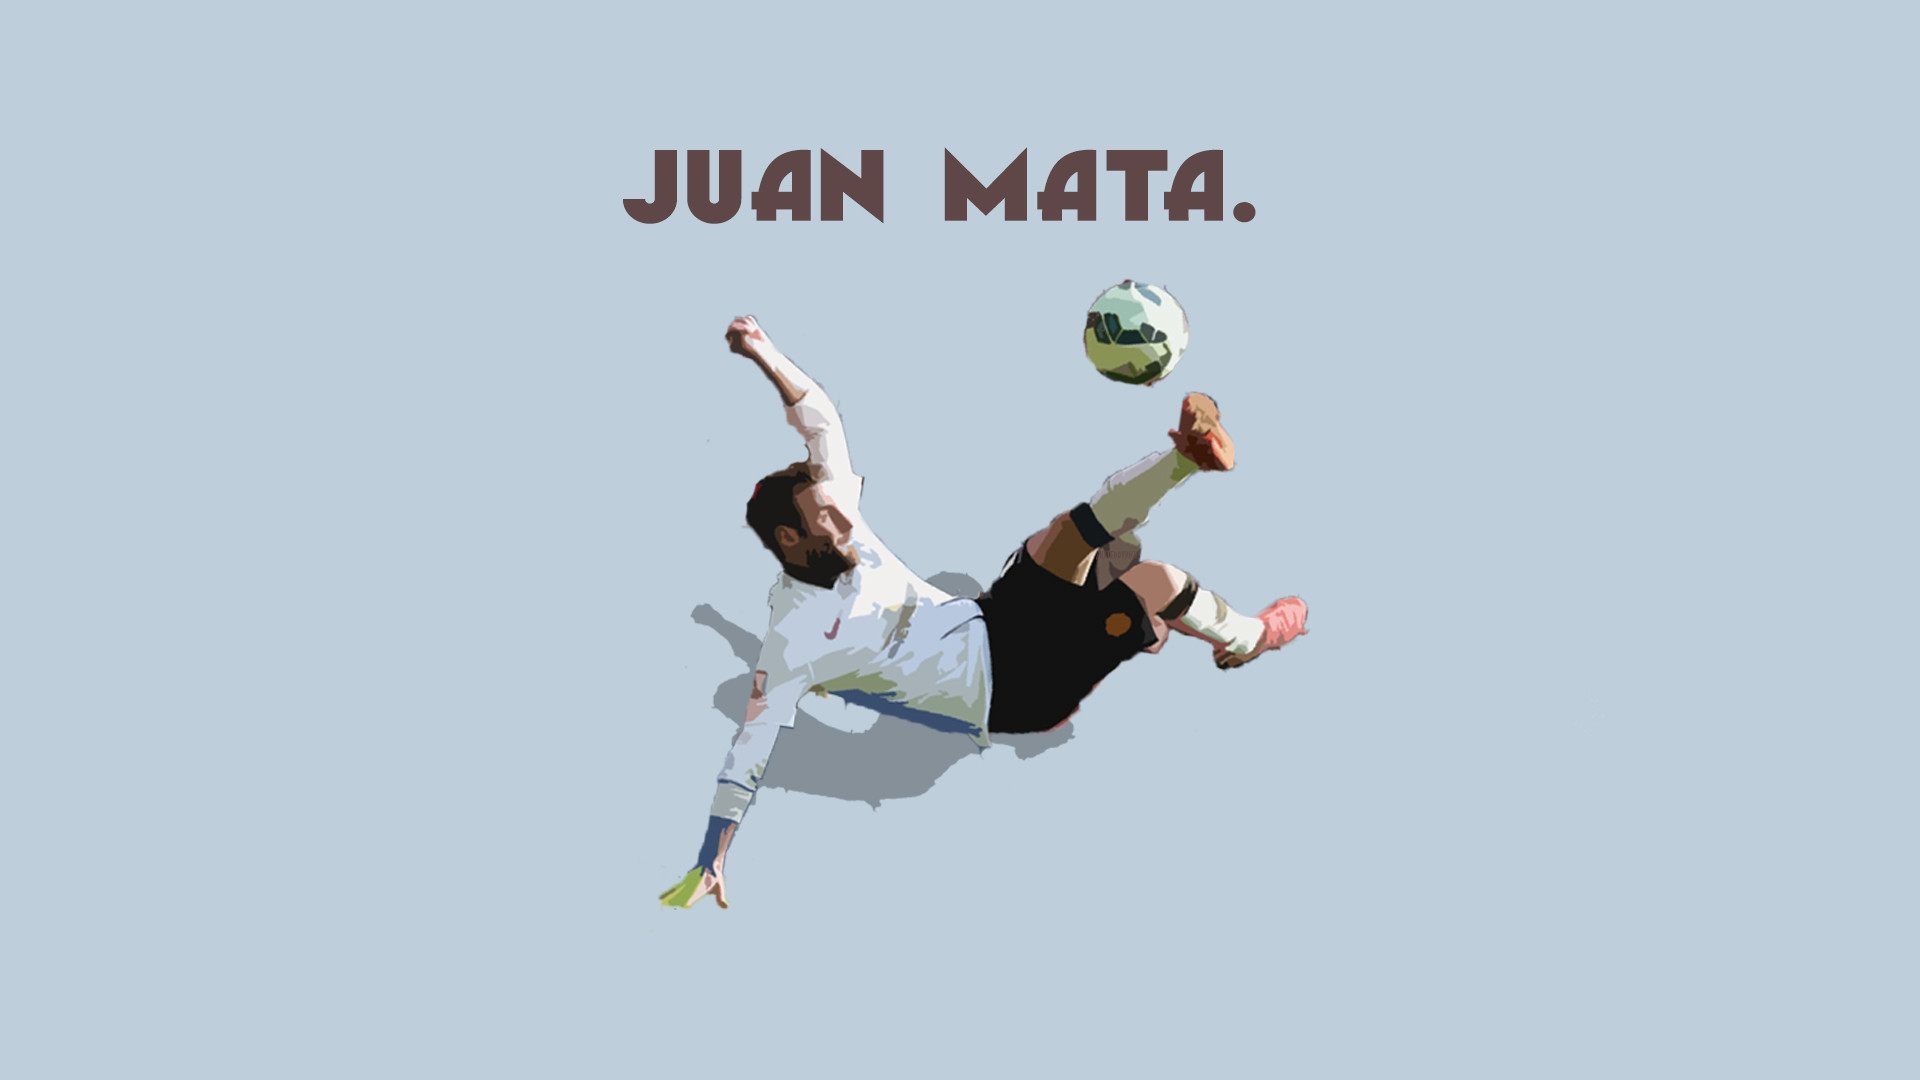 Juan Mata Wallpapers (81+ Images